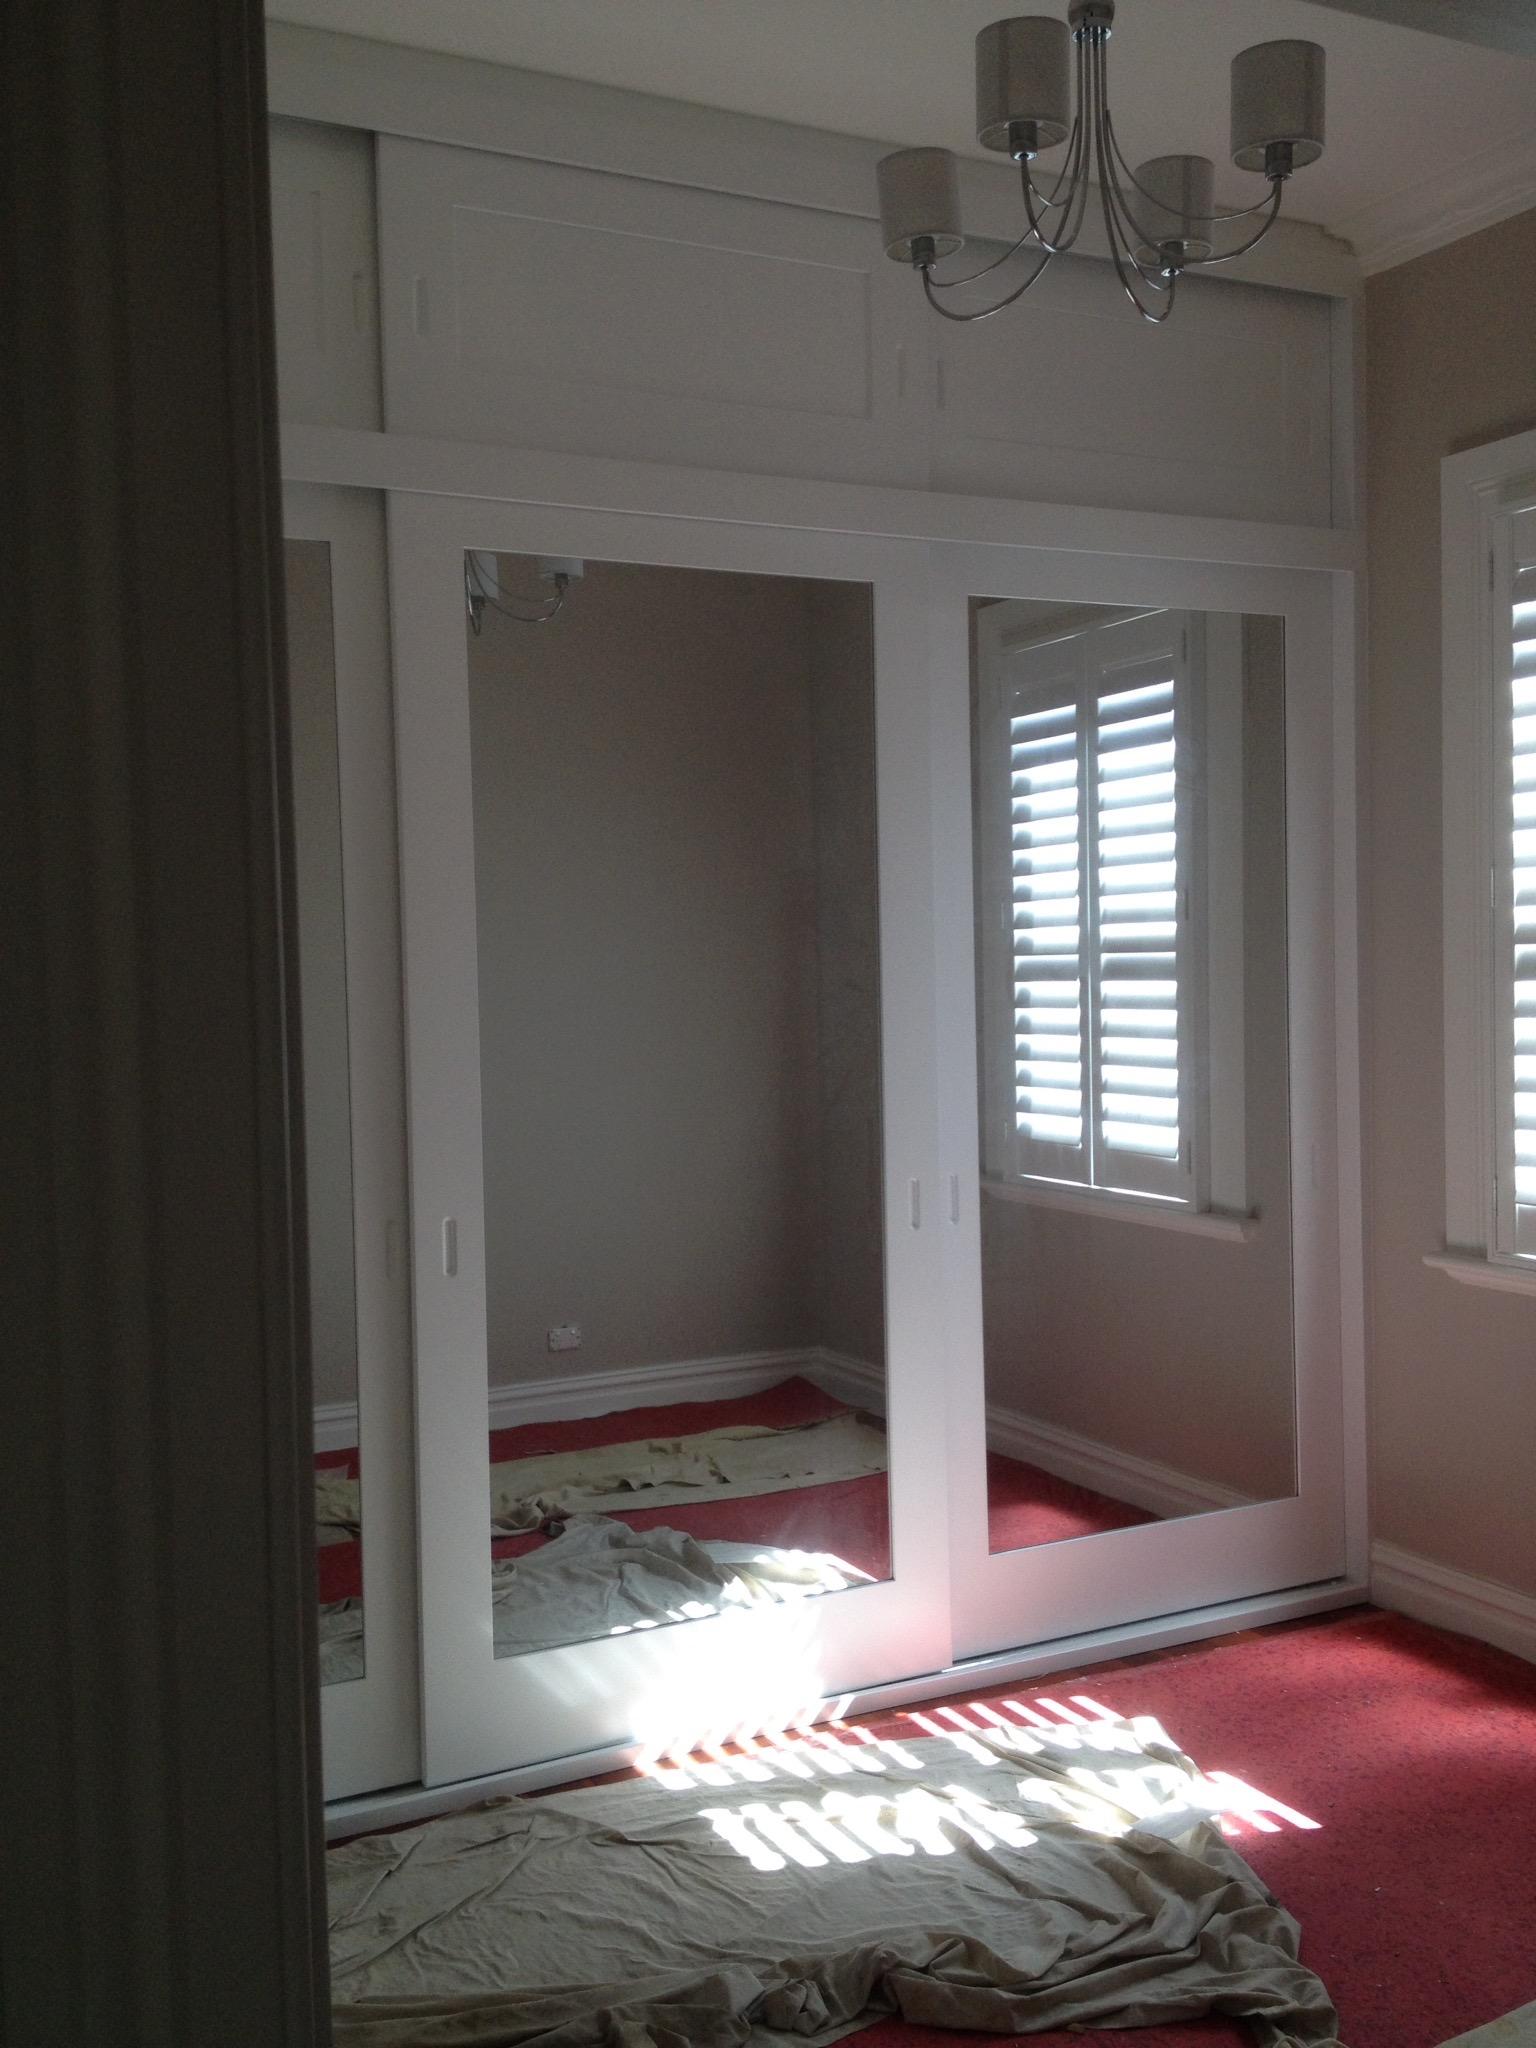 three door sliding polyurethane wardrobe with mirror inserts.JPG